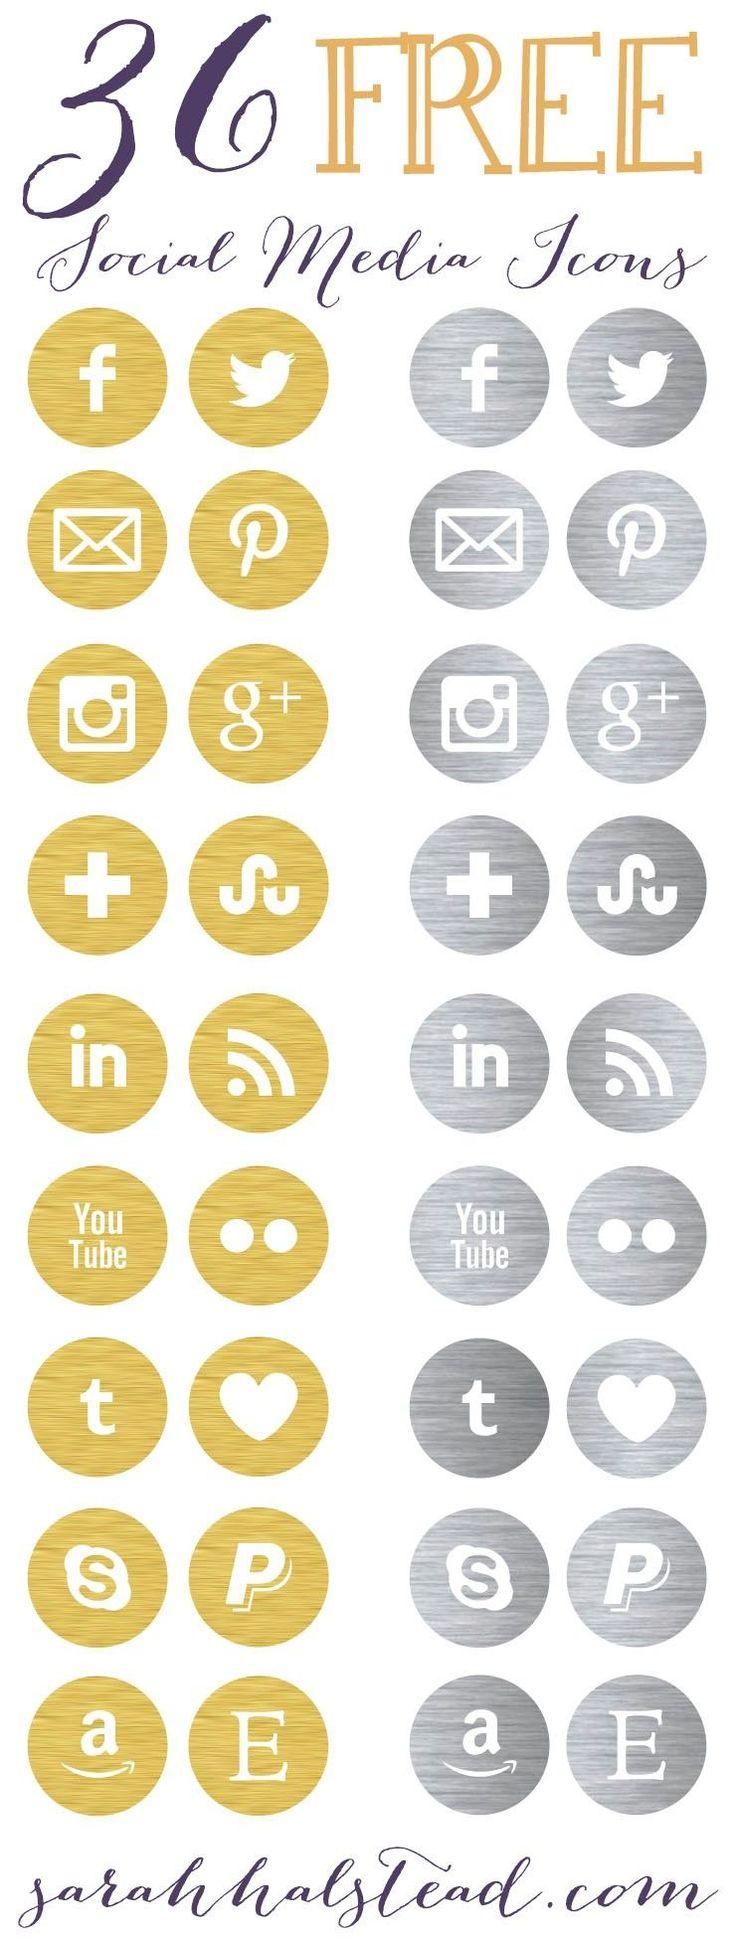 36 Free Social Media Icons (Scheduled via TrafficWonker.com)